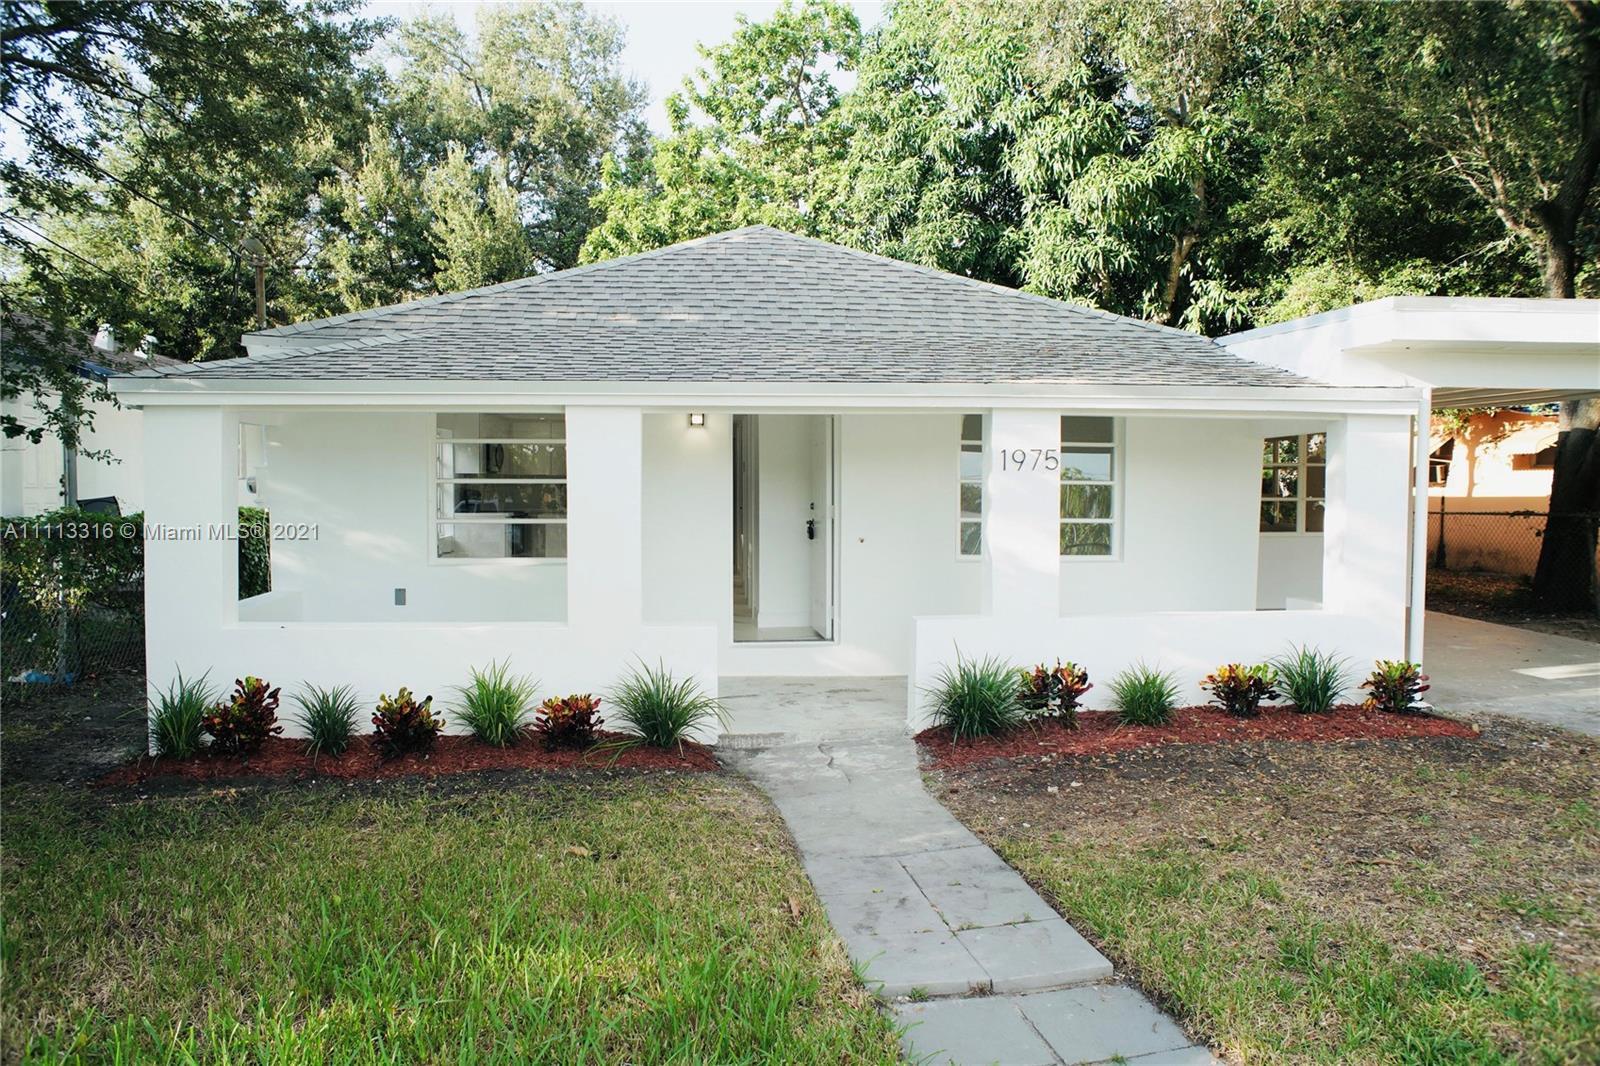 Single Family Home For Sale 1ST ADDN TO MAGNOLIA SUB1,022 Sqft